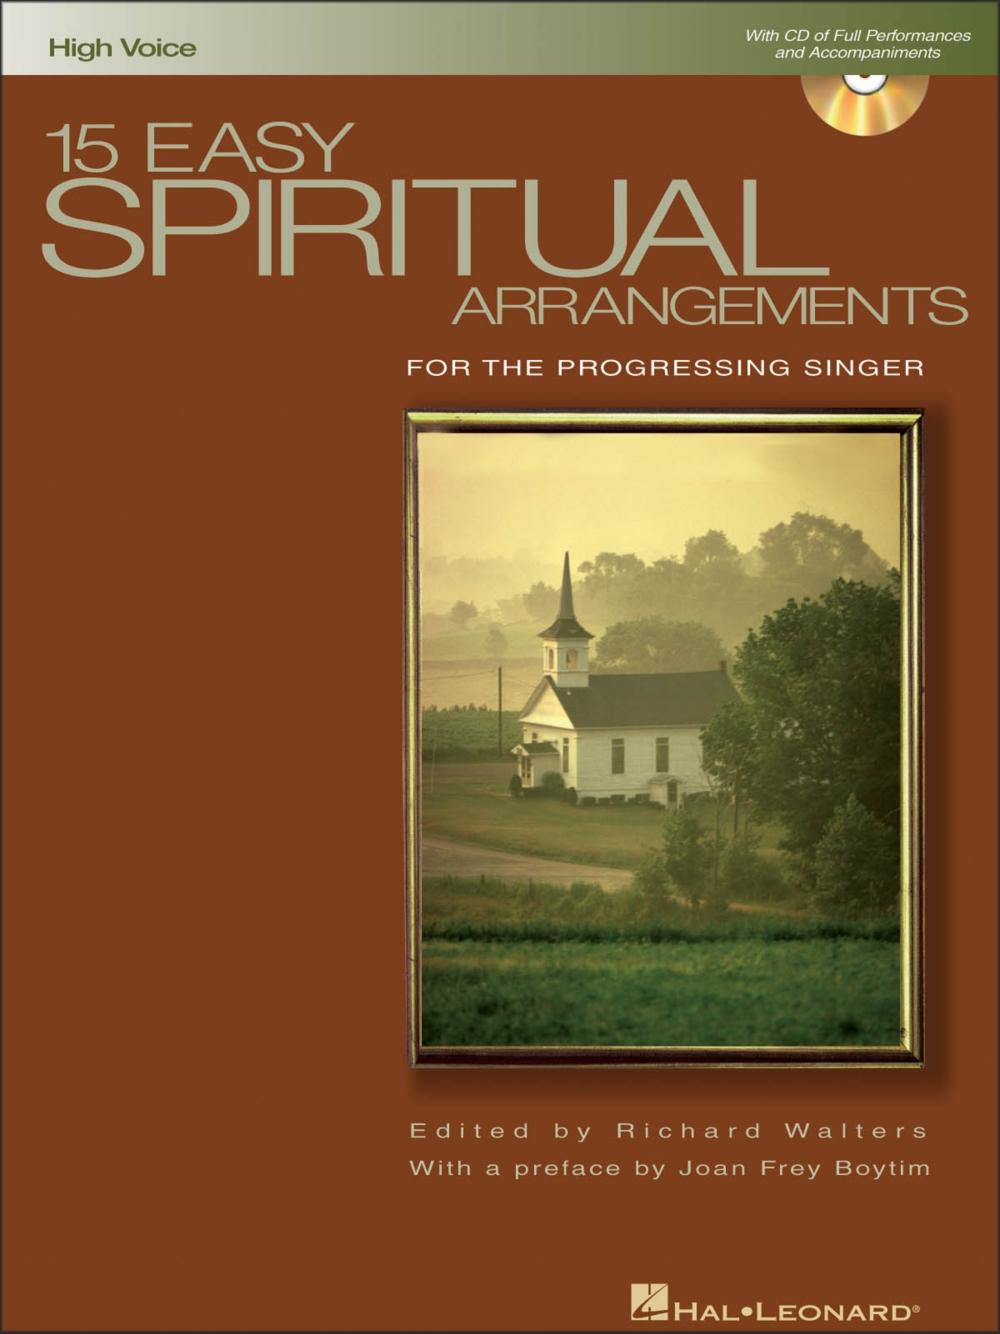 Hal Leonard 15 Easy Spiritual Arrangements for High Voice Book CD by